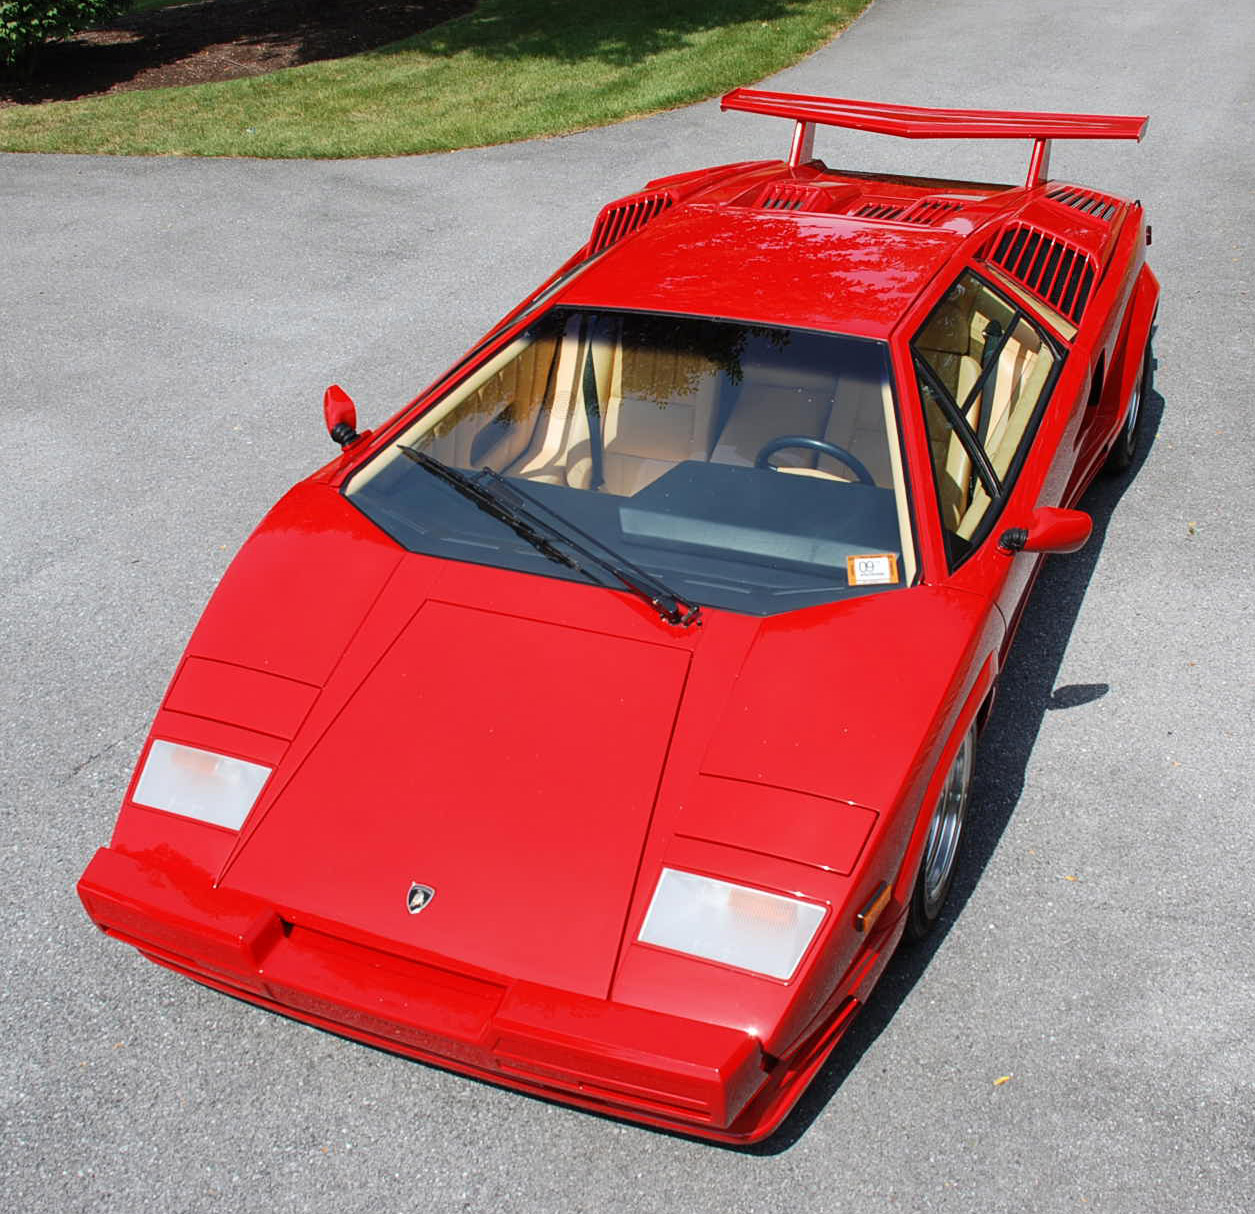 Lamborghini Countach Tire Size Lamborghini Super Car